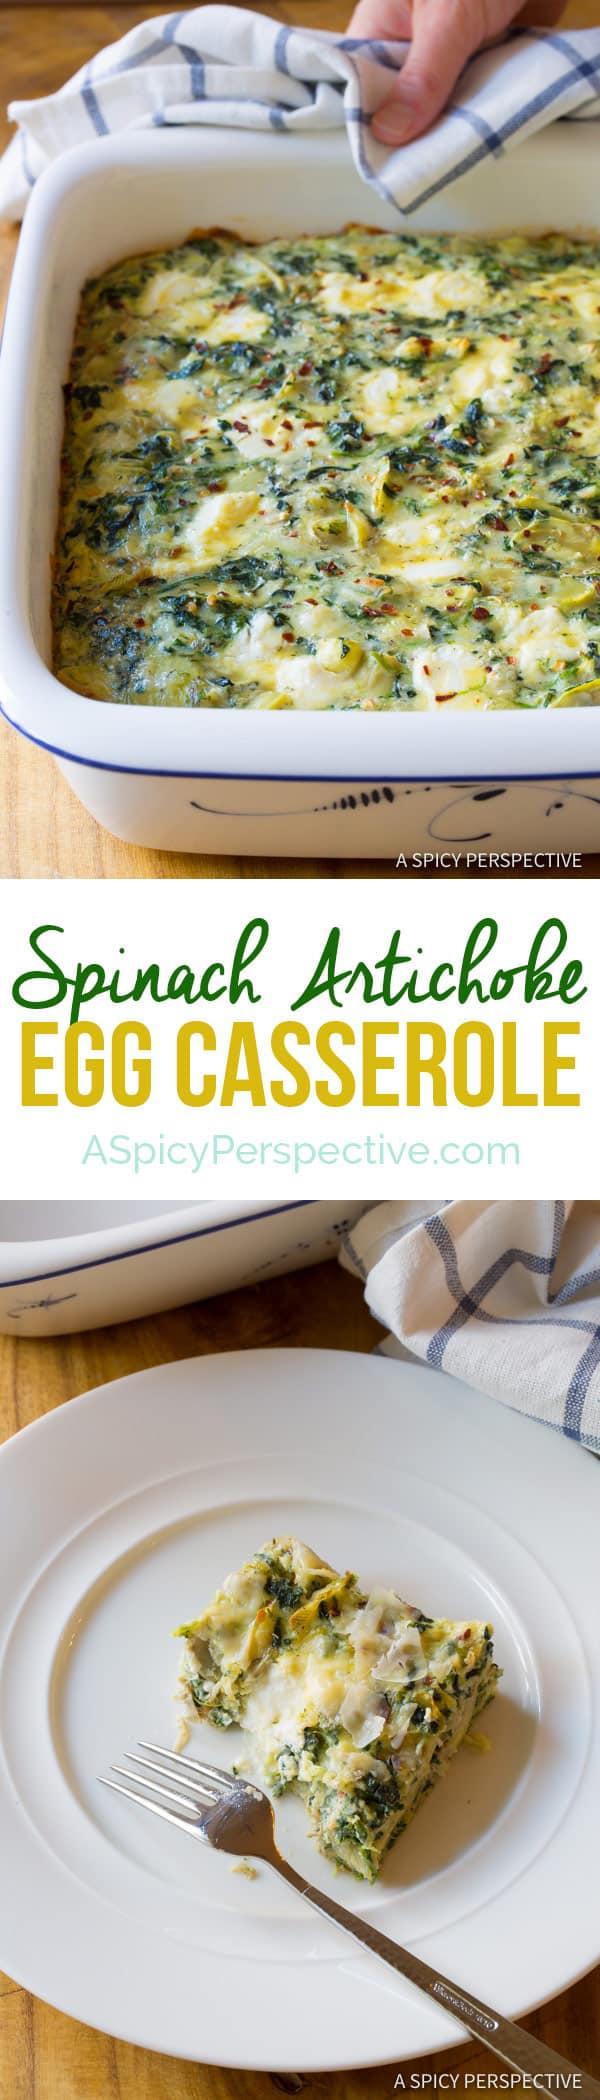 Zesty Spinach Artichoke Egg Casserole (Low Carb, Vegetarian & Gluten Free!) | ASpicyPerspective.com